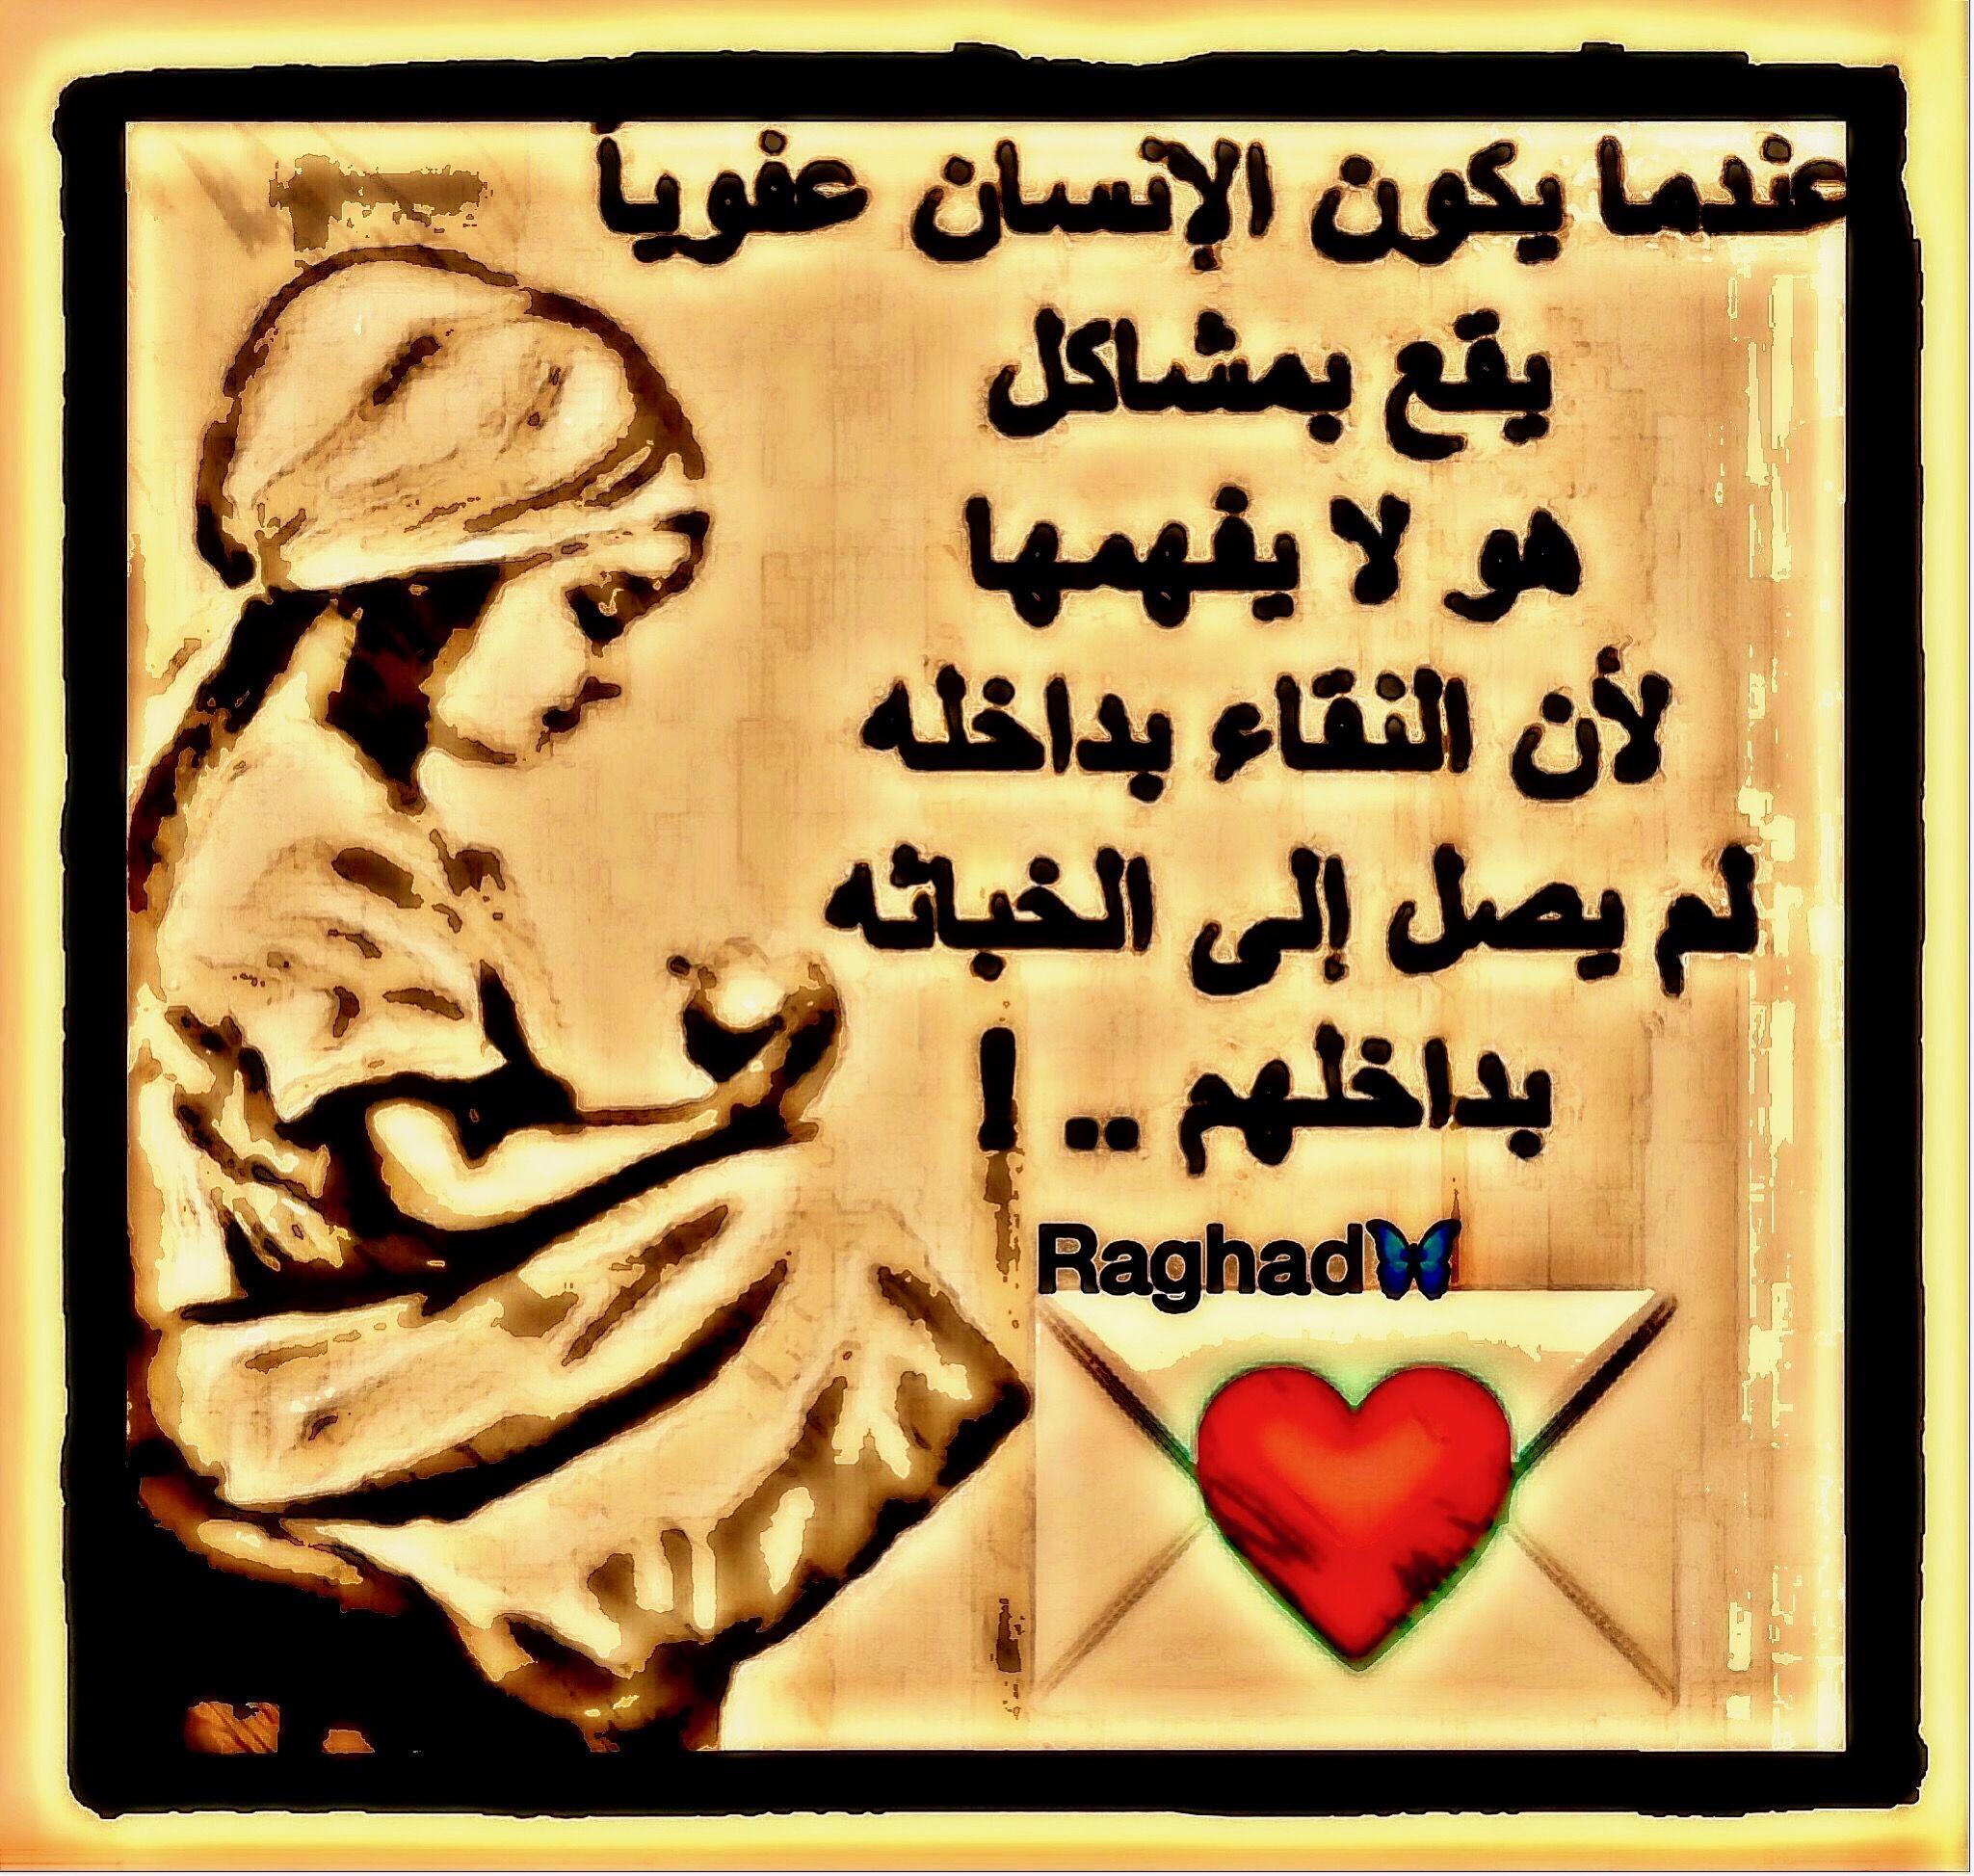 Desertrose رضا الناس غاية لا تدرك ورضا الله غاية لا تترك فاترك ما لا يدرك وأدرك ما لا يترك Desert Rose Rose Arabic Calligraphy